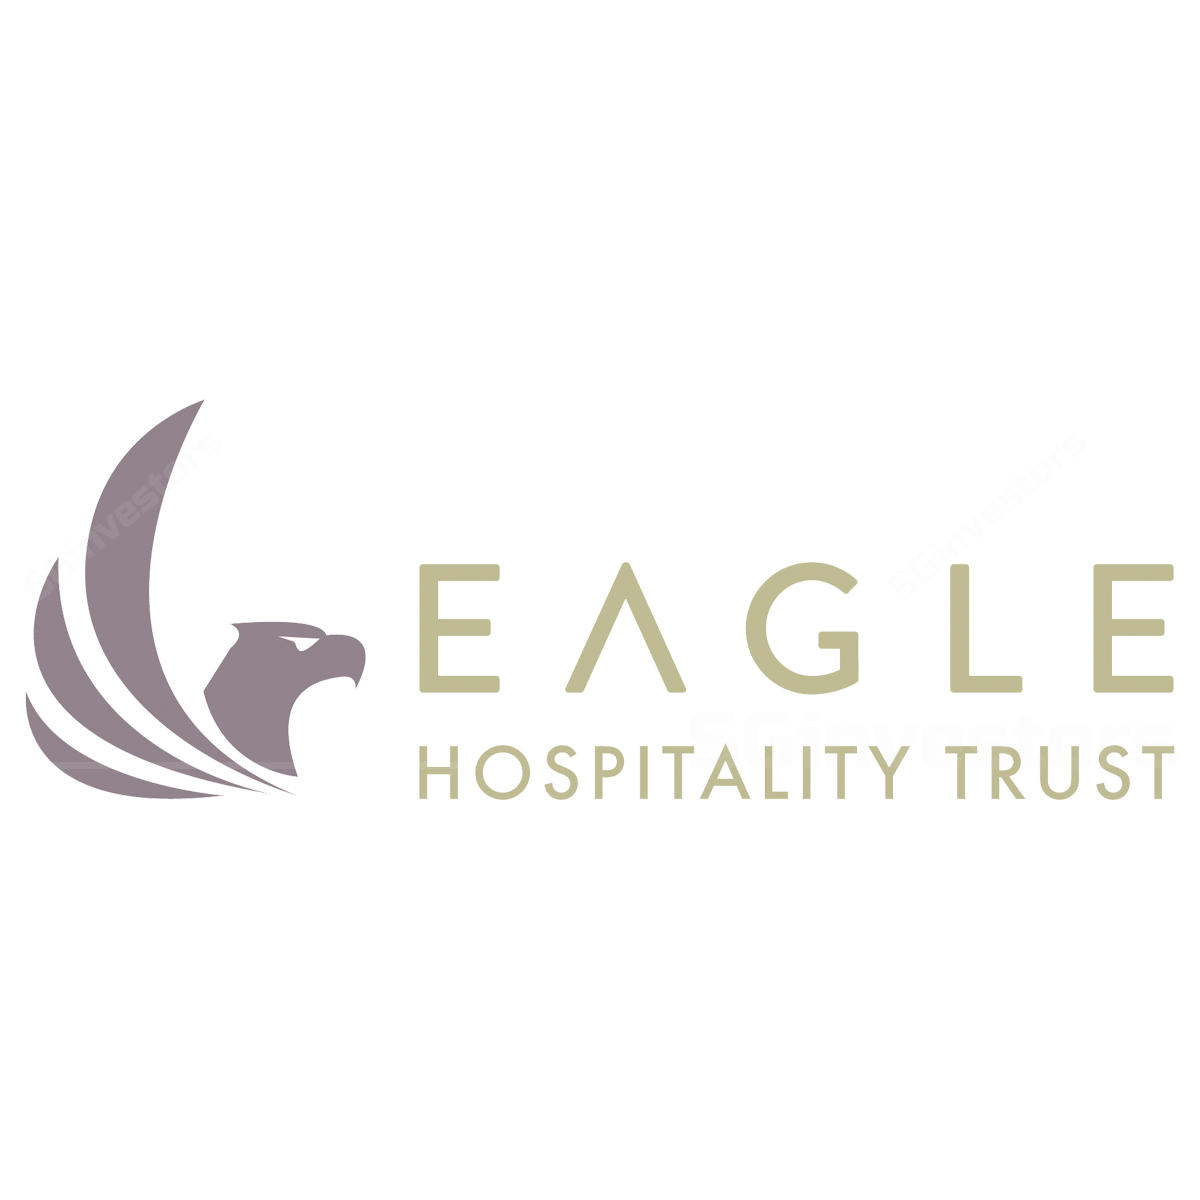 Eagle hospitality trust ipo singapore